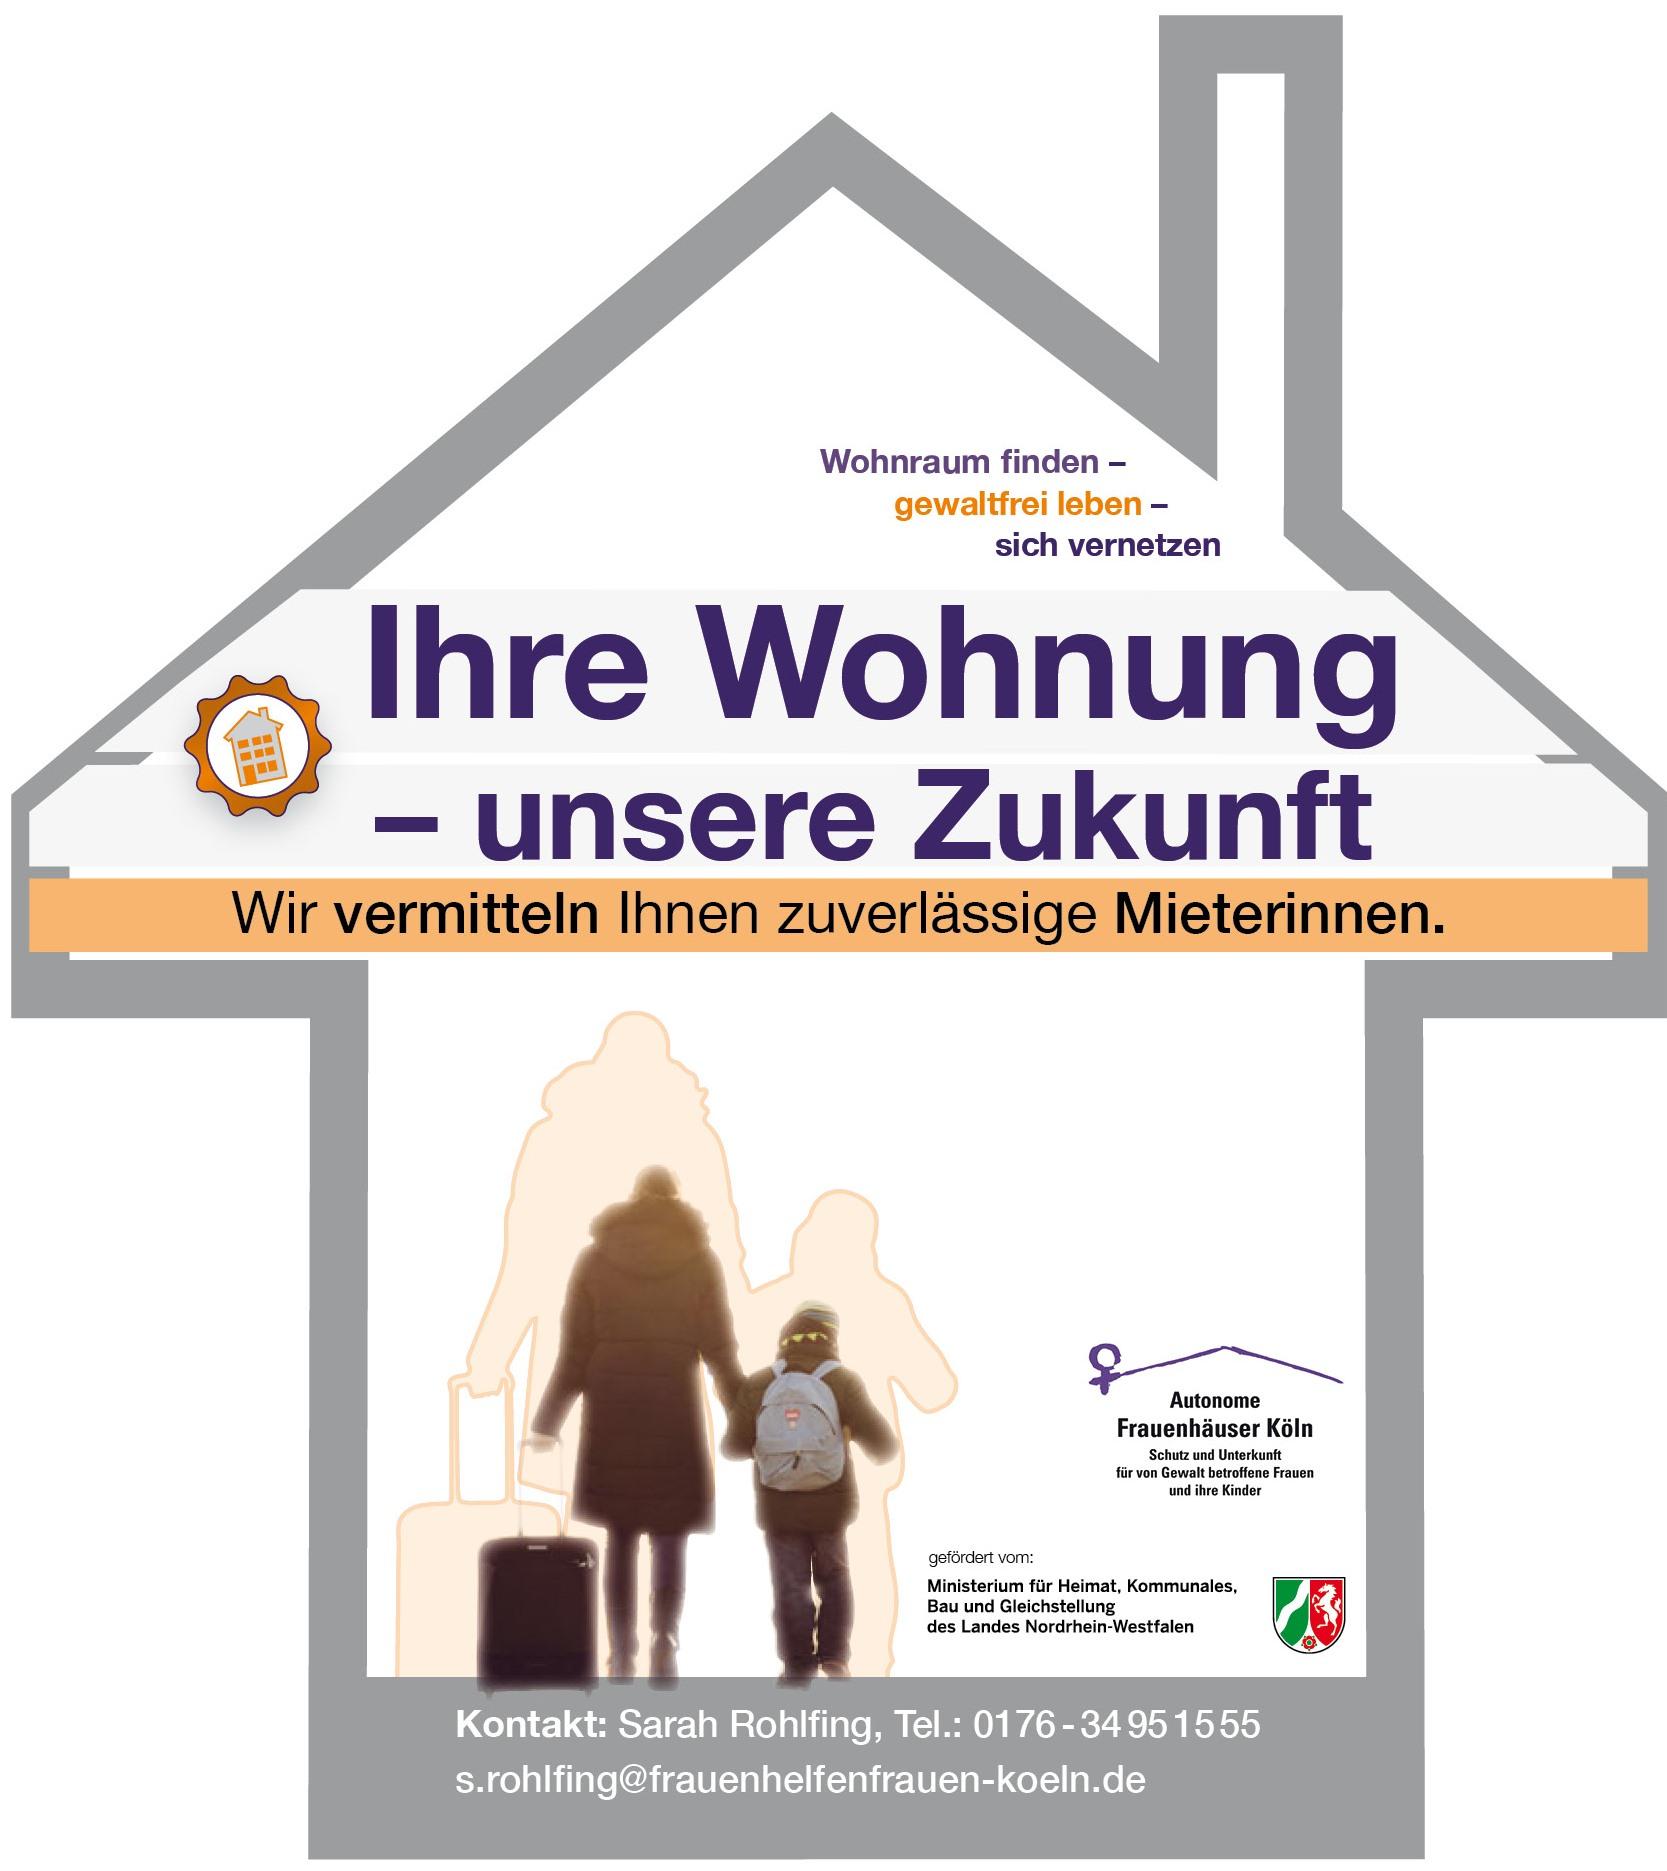 Frauenhäuser Köln